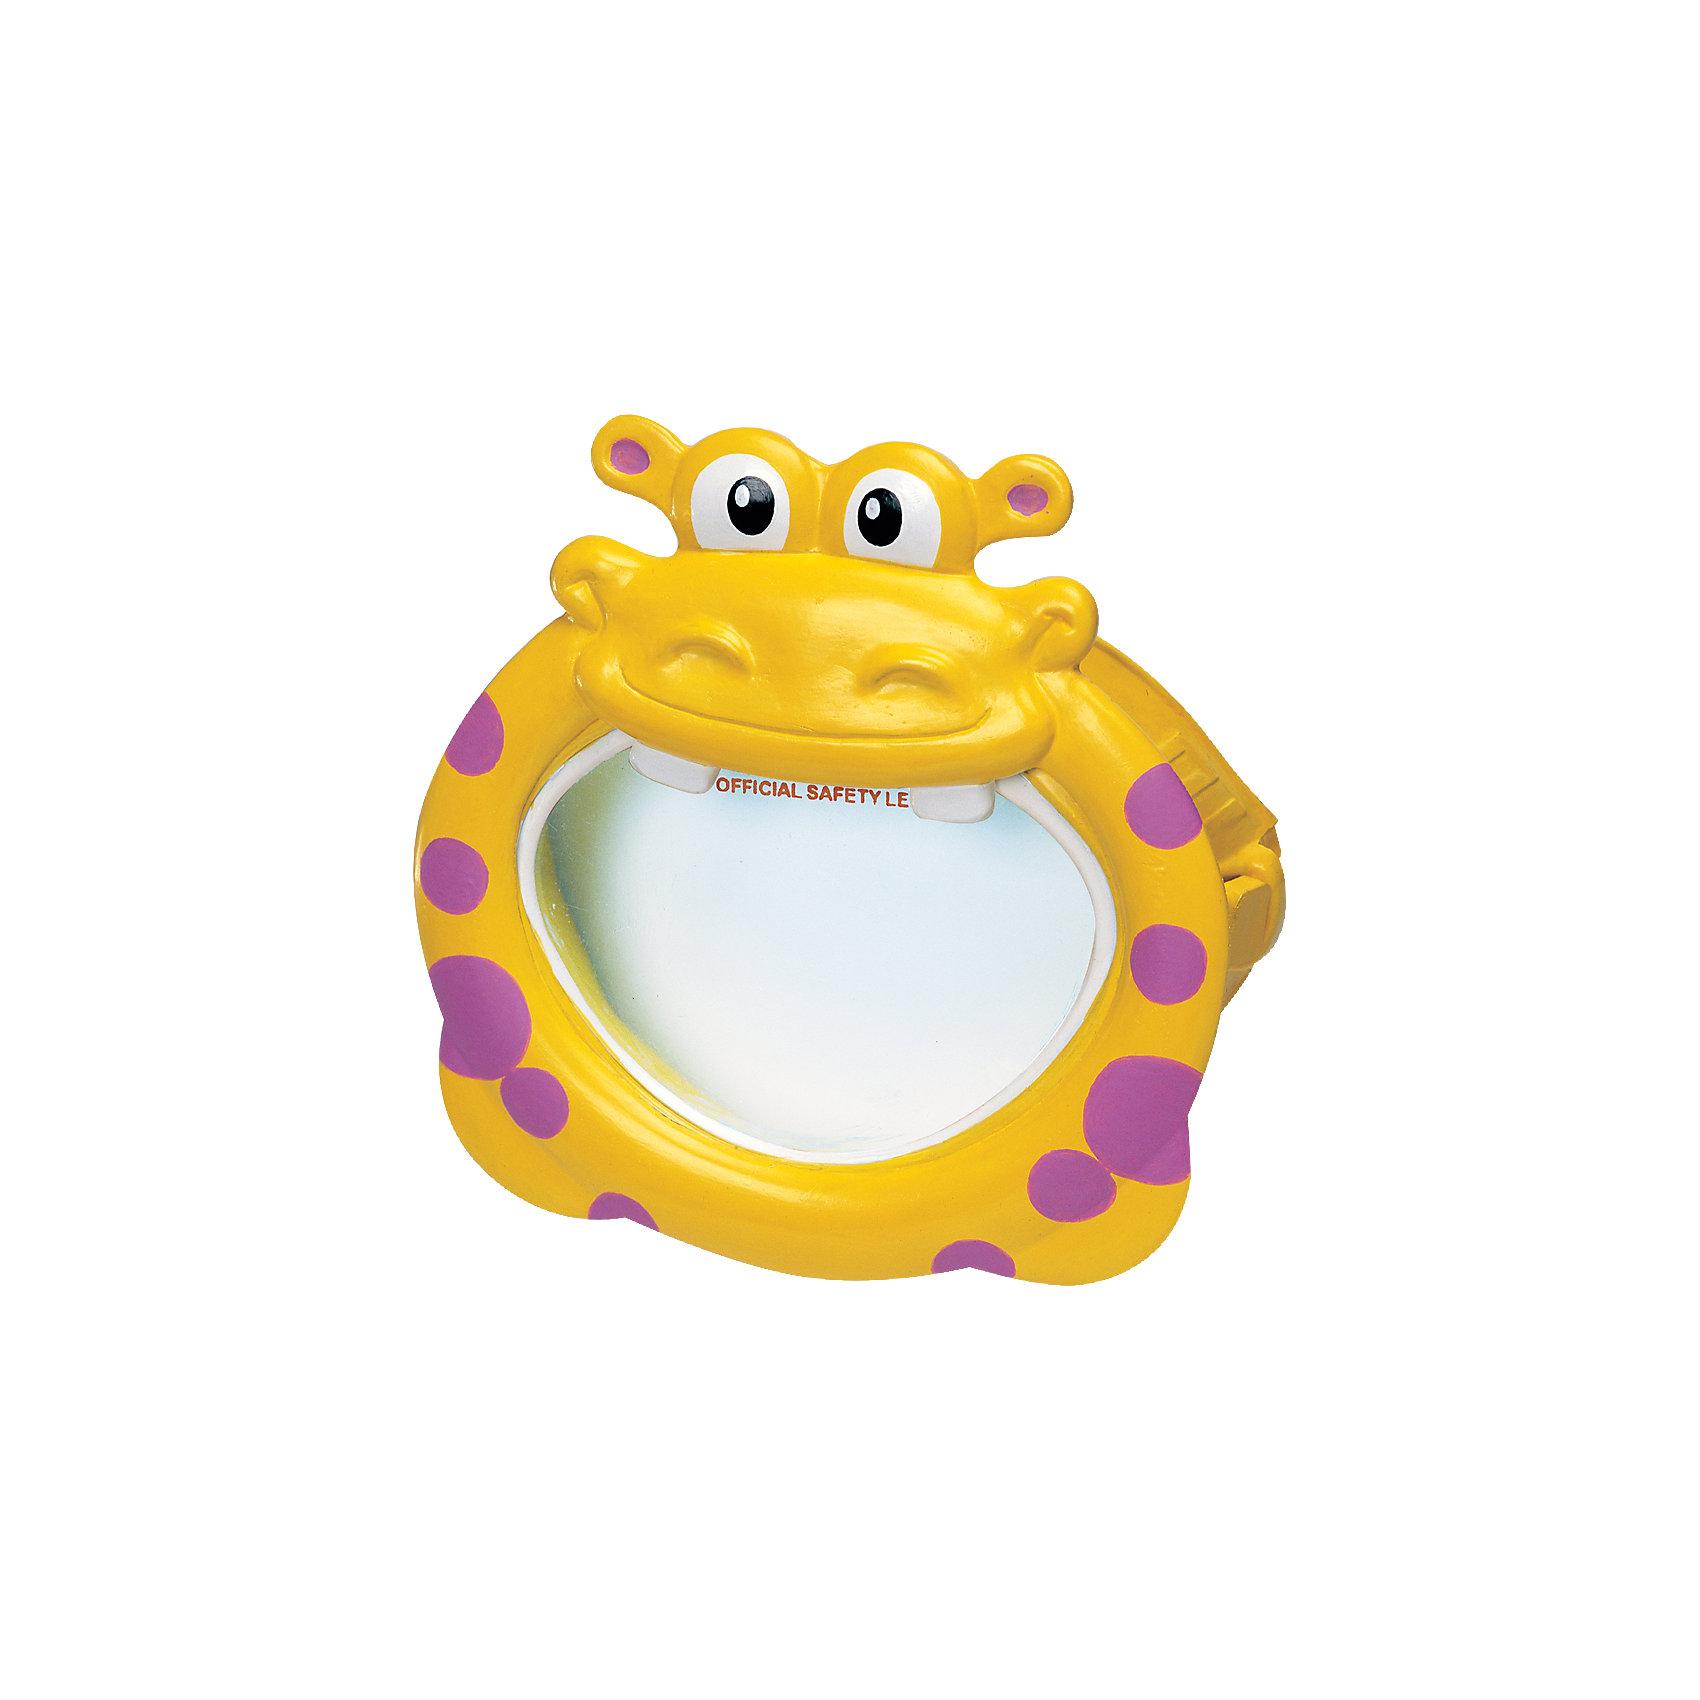 Intex Маска для плавания Бегемот/Лягушка, Intex, в ассорт. очки маски и трубки для плавания intex маска авиатор для плавания 55911